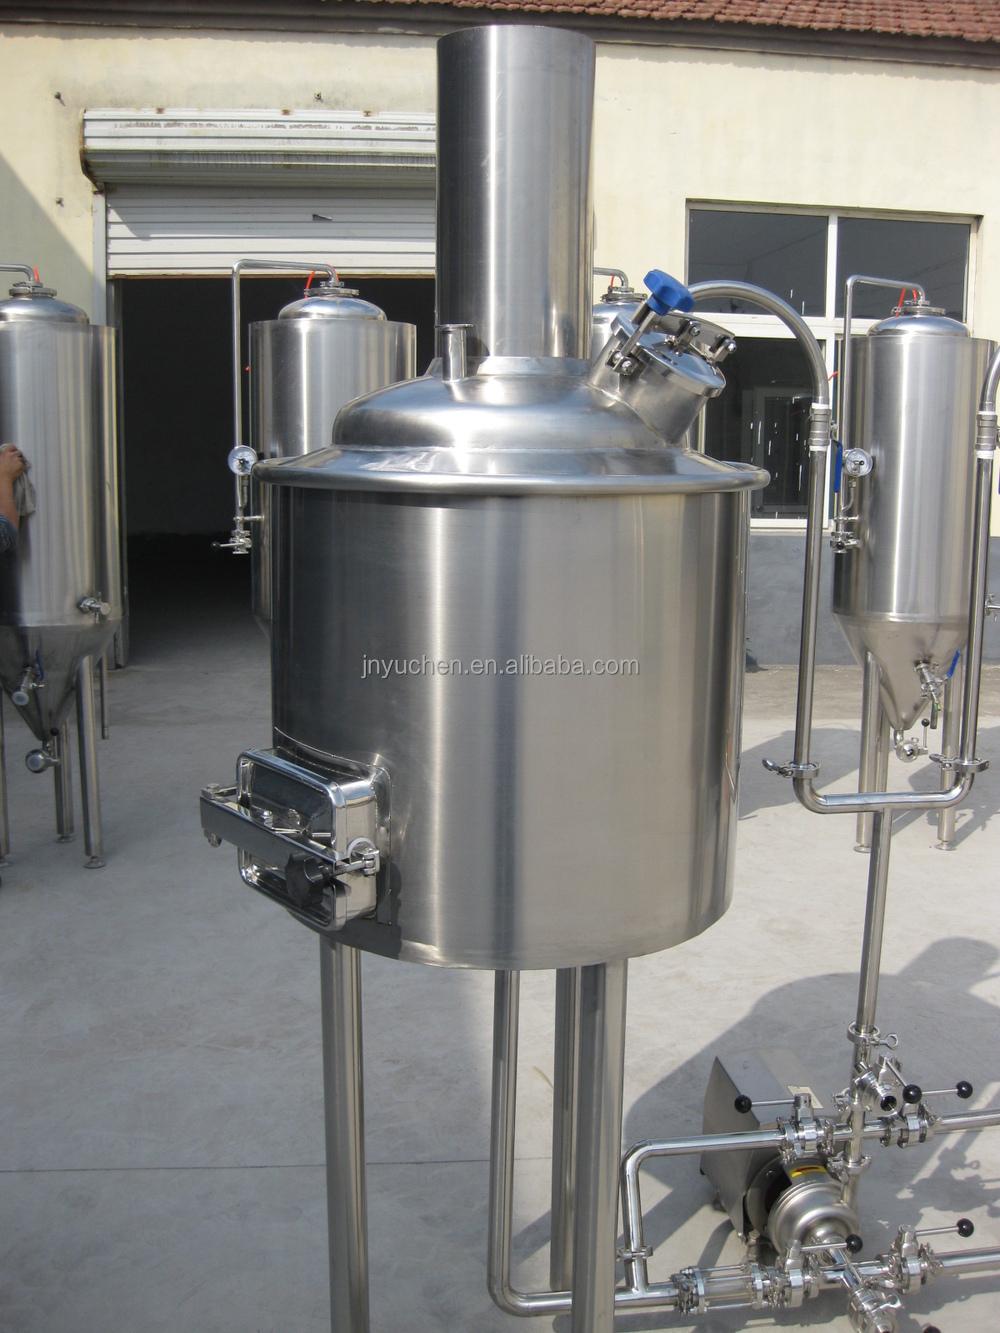 Small Beer Tank 15bbl Steam Heating Jacket Mash Lauter Tun